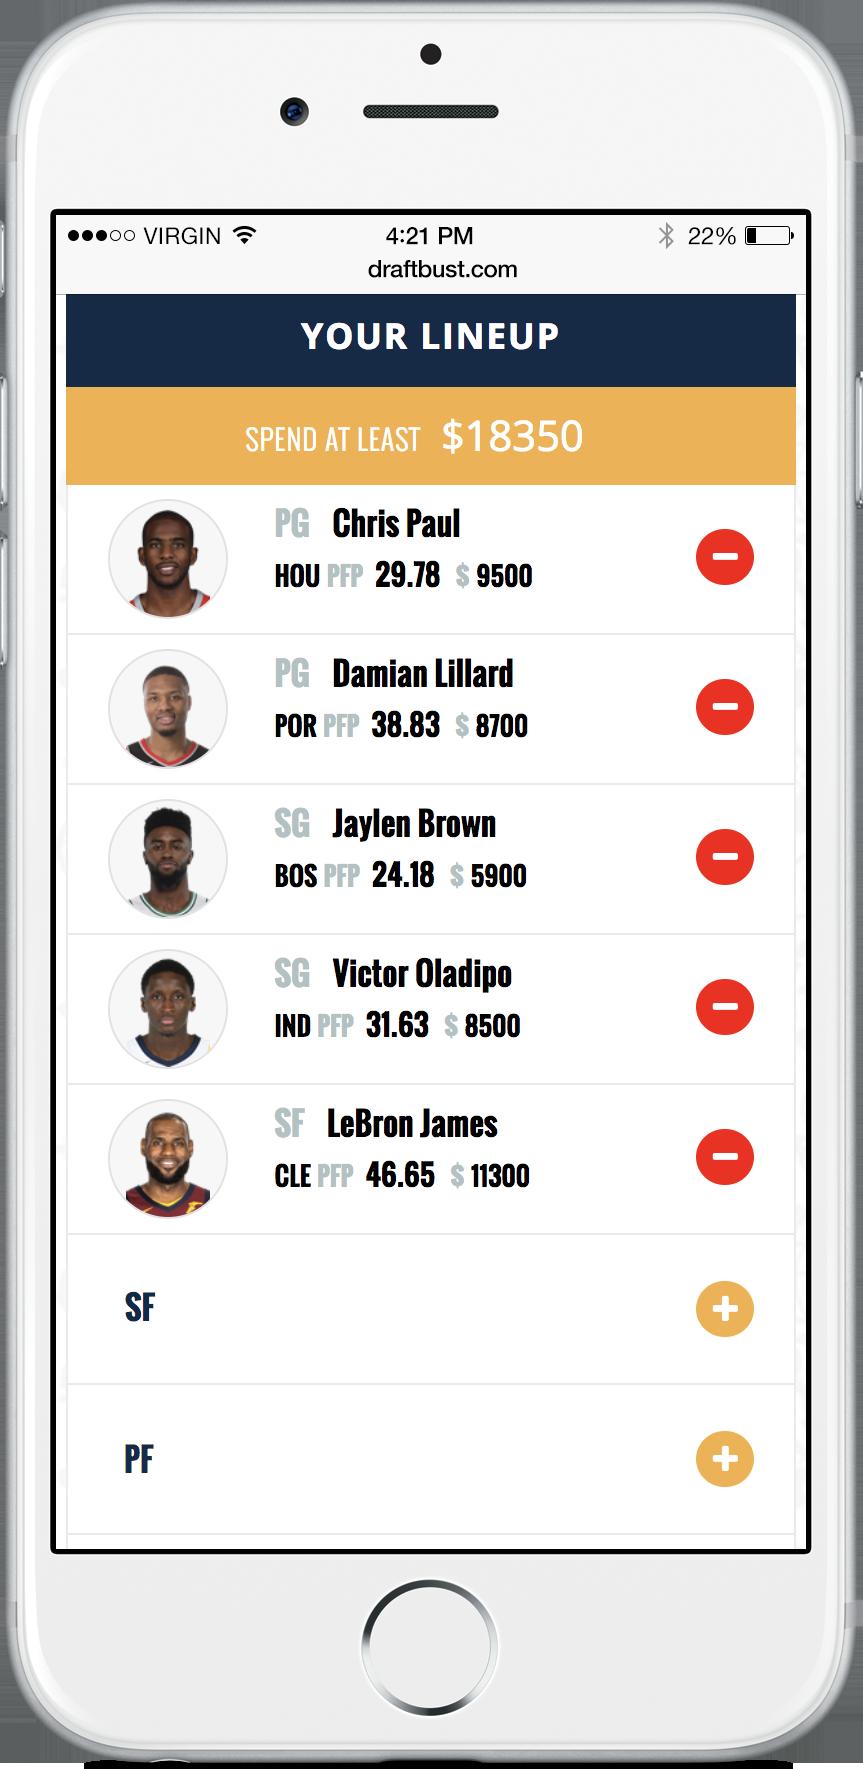 screenshot of your lineup